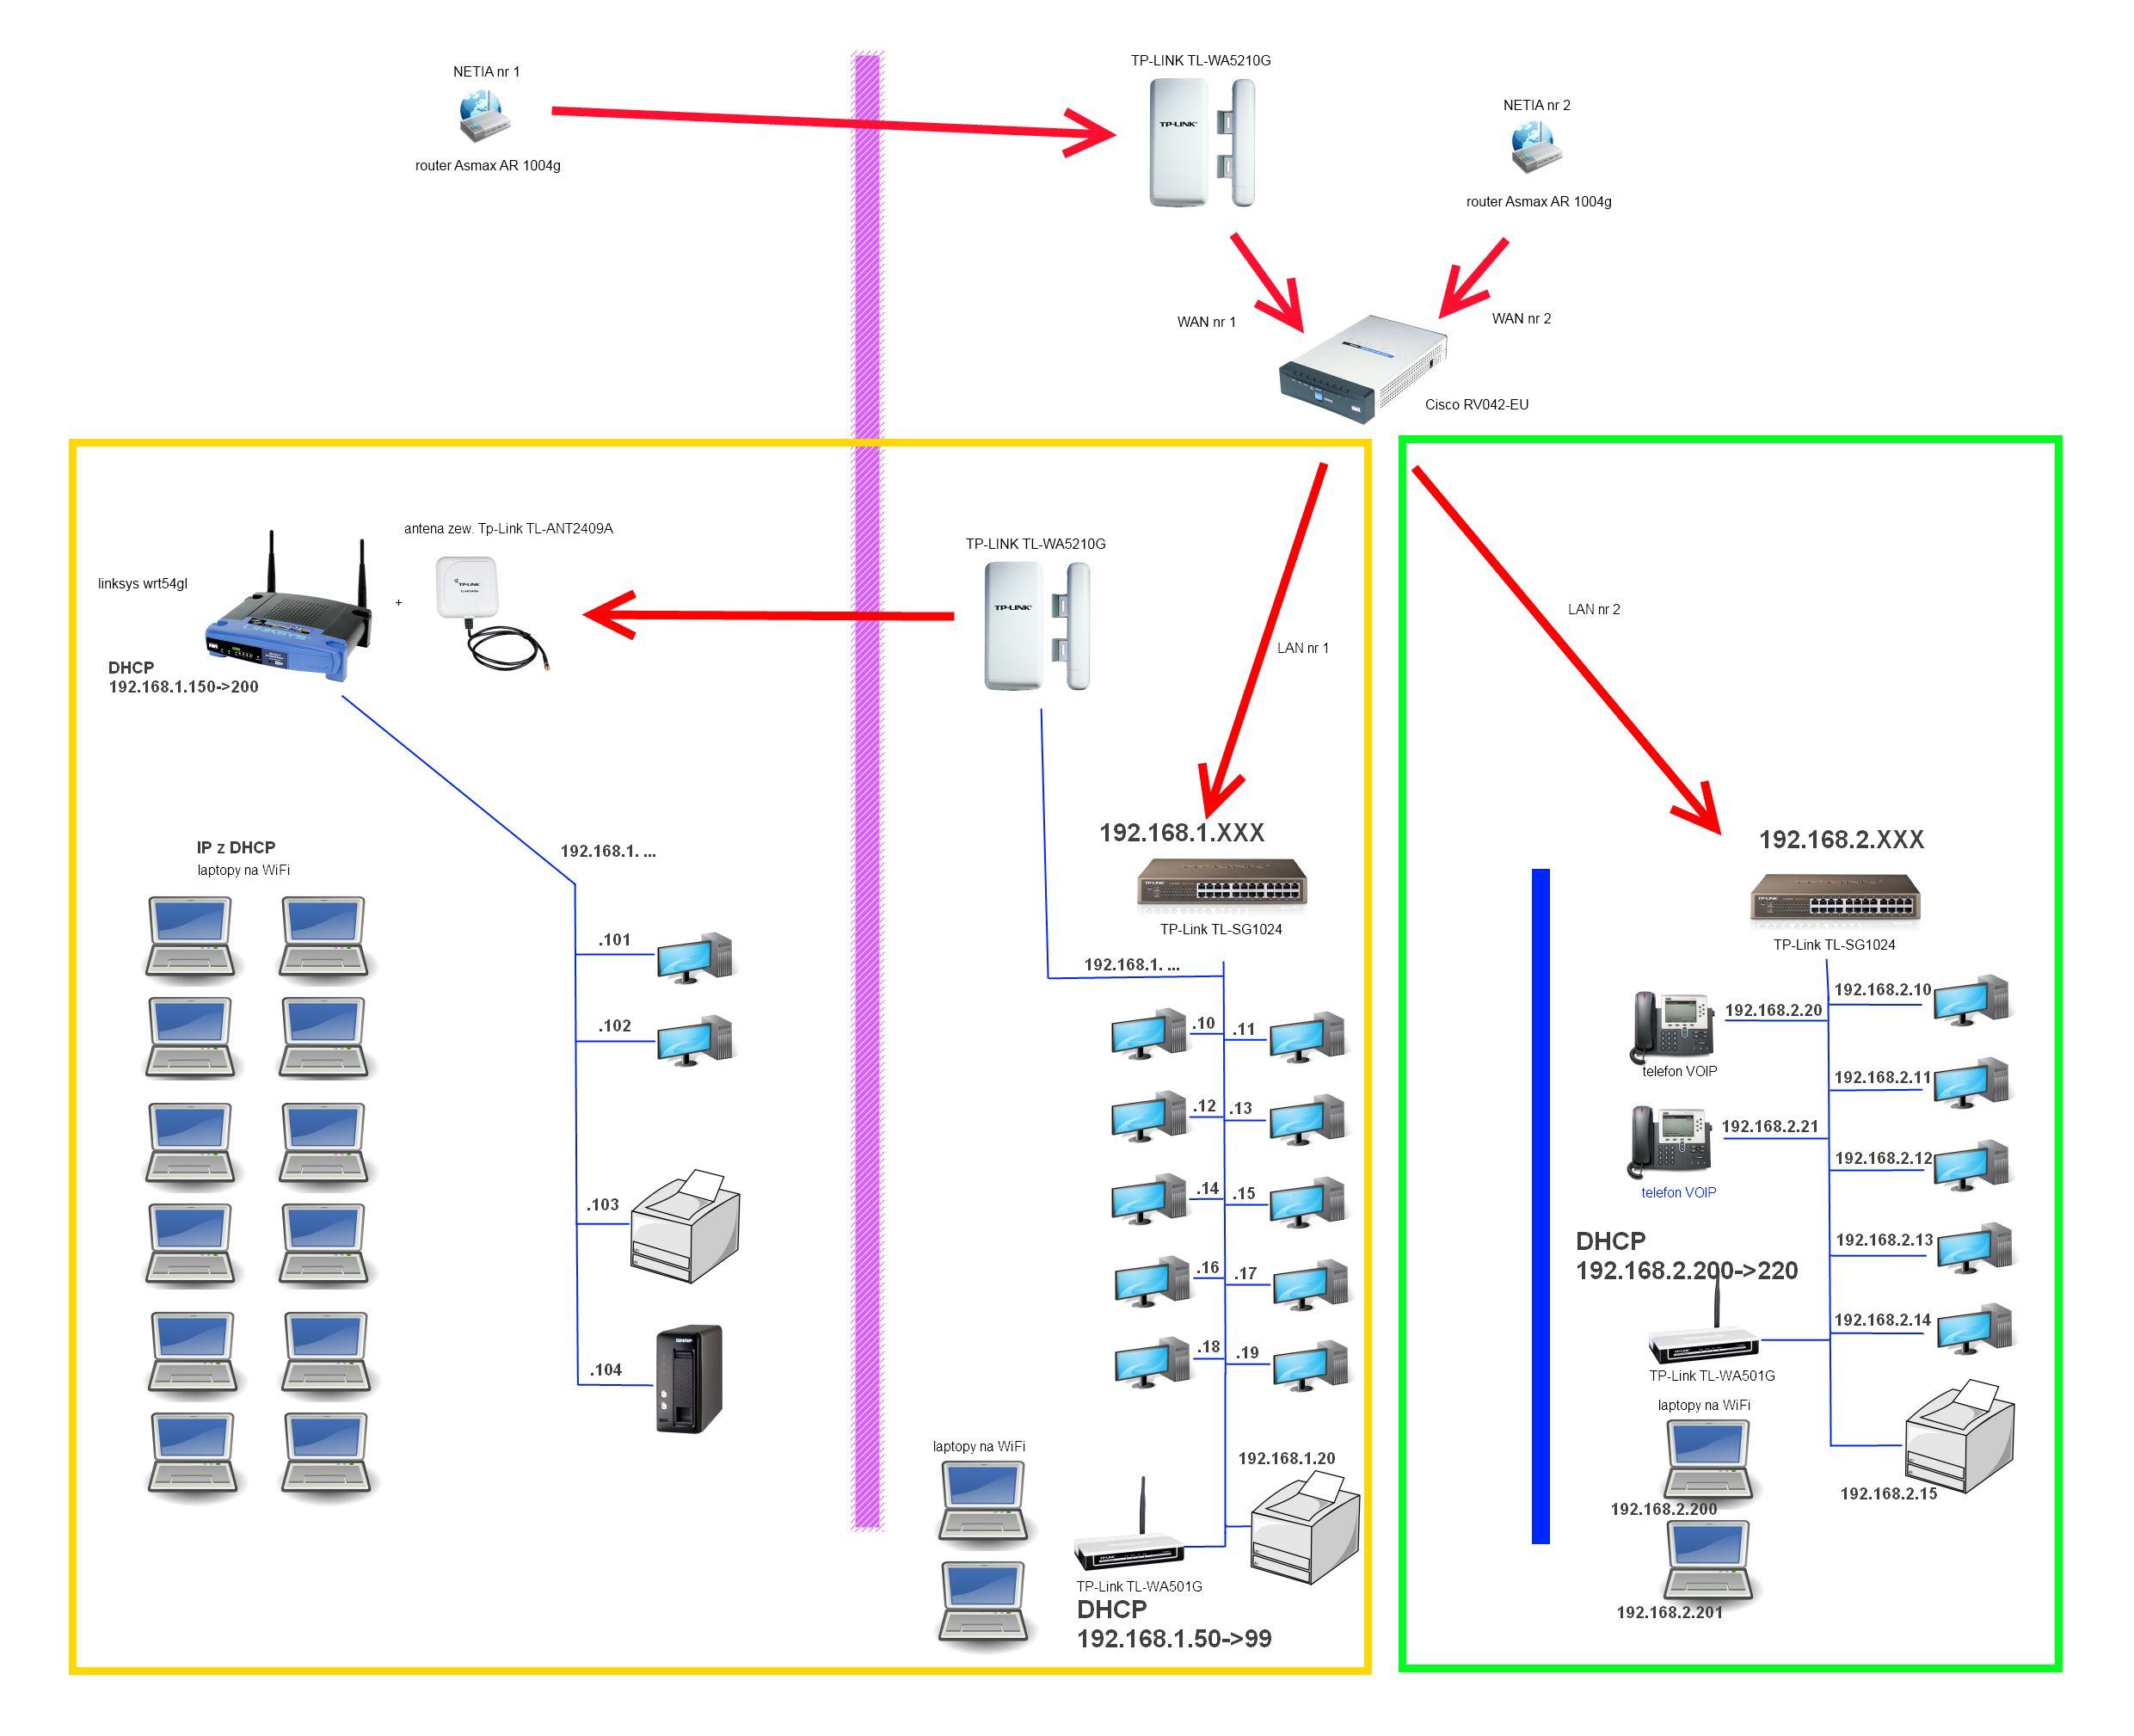 schemat sieci - pro�ba o porad�/opini�